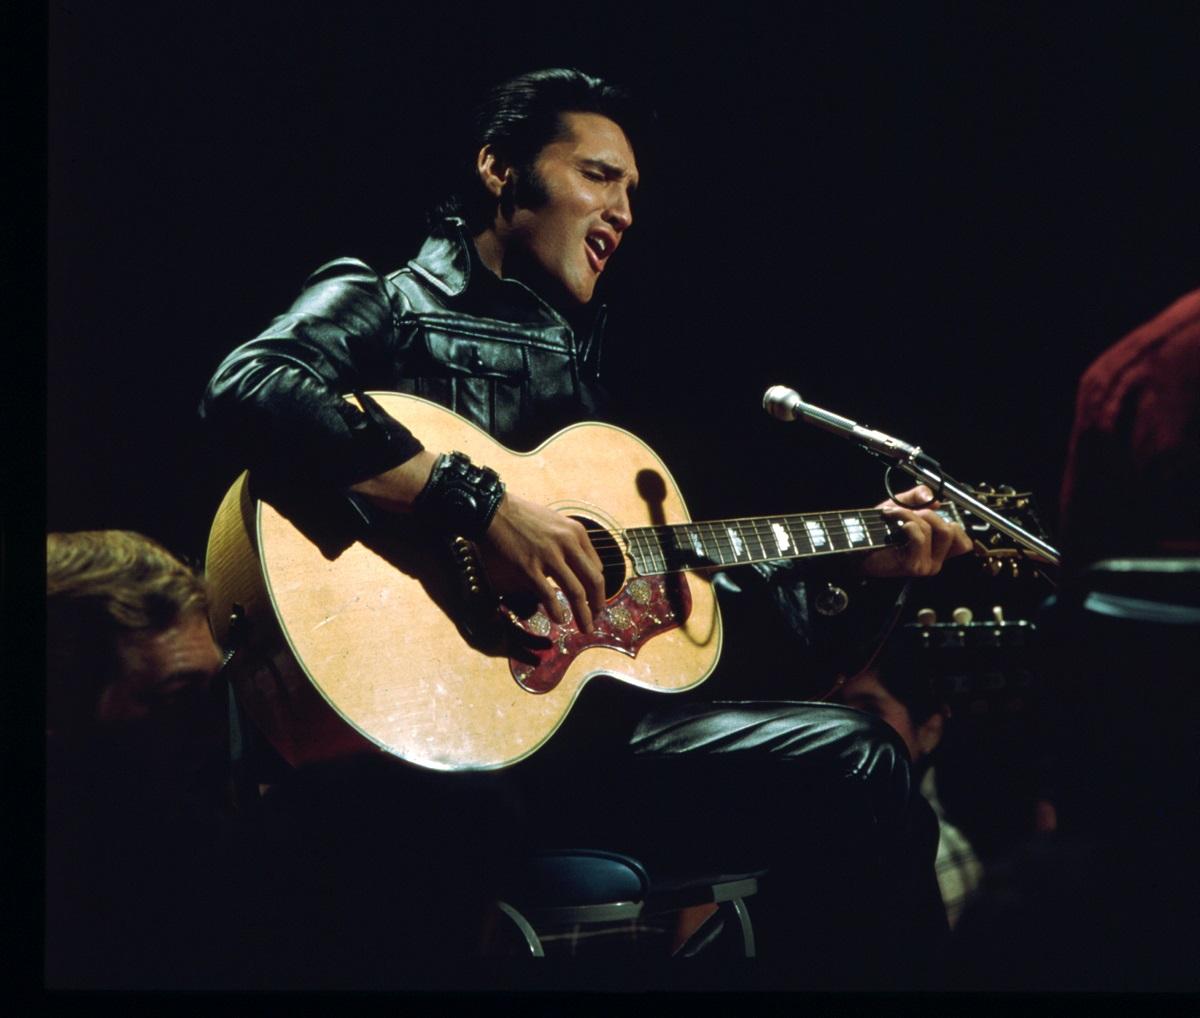 Elvis Presley performing on the Elvis comeback TV special on June 27, 1968 in Burbank, California.